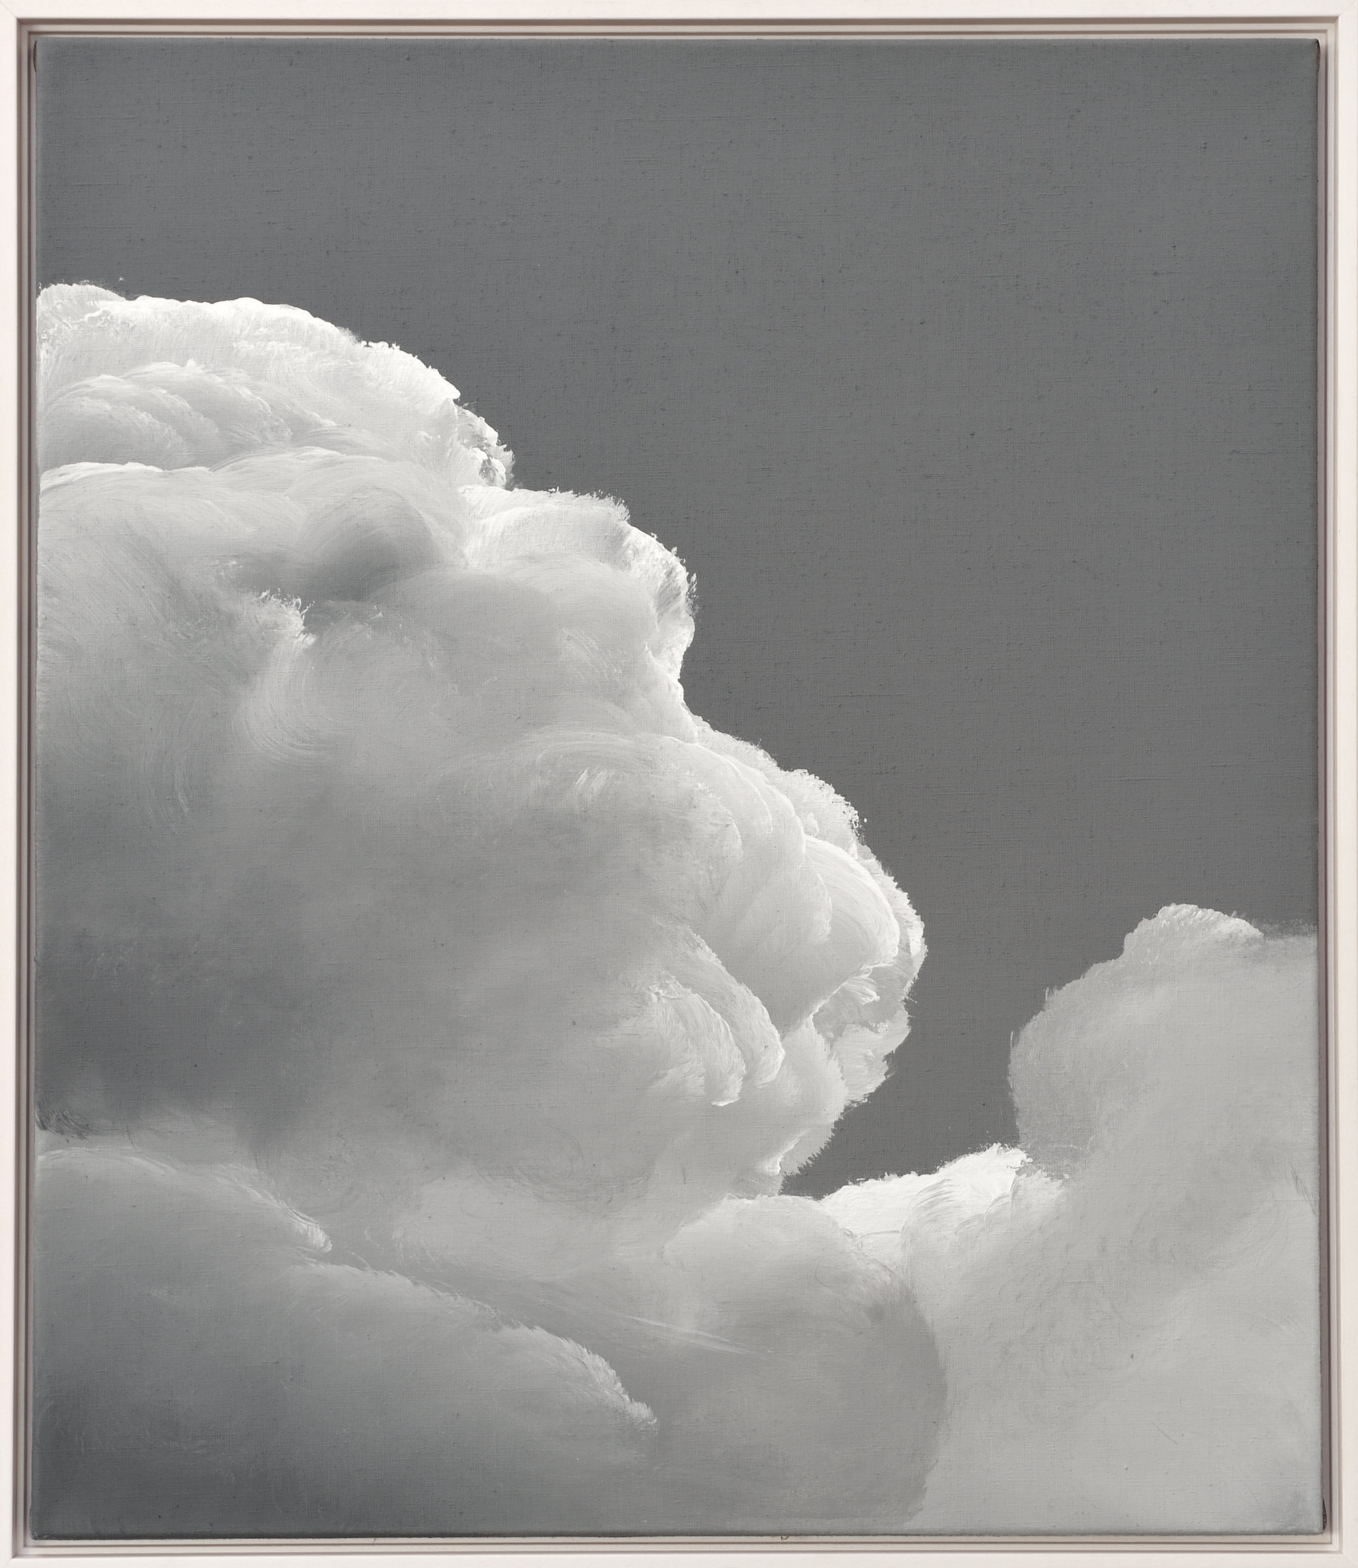 Clouds | 2016 acrylic on linen 60 x 50 cm